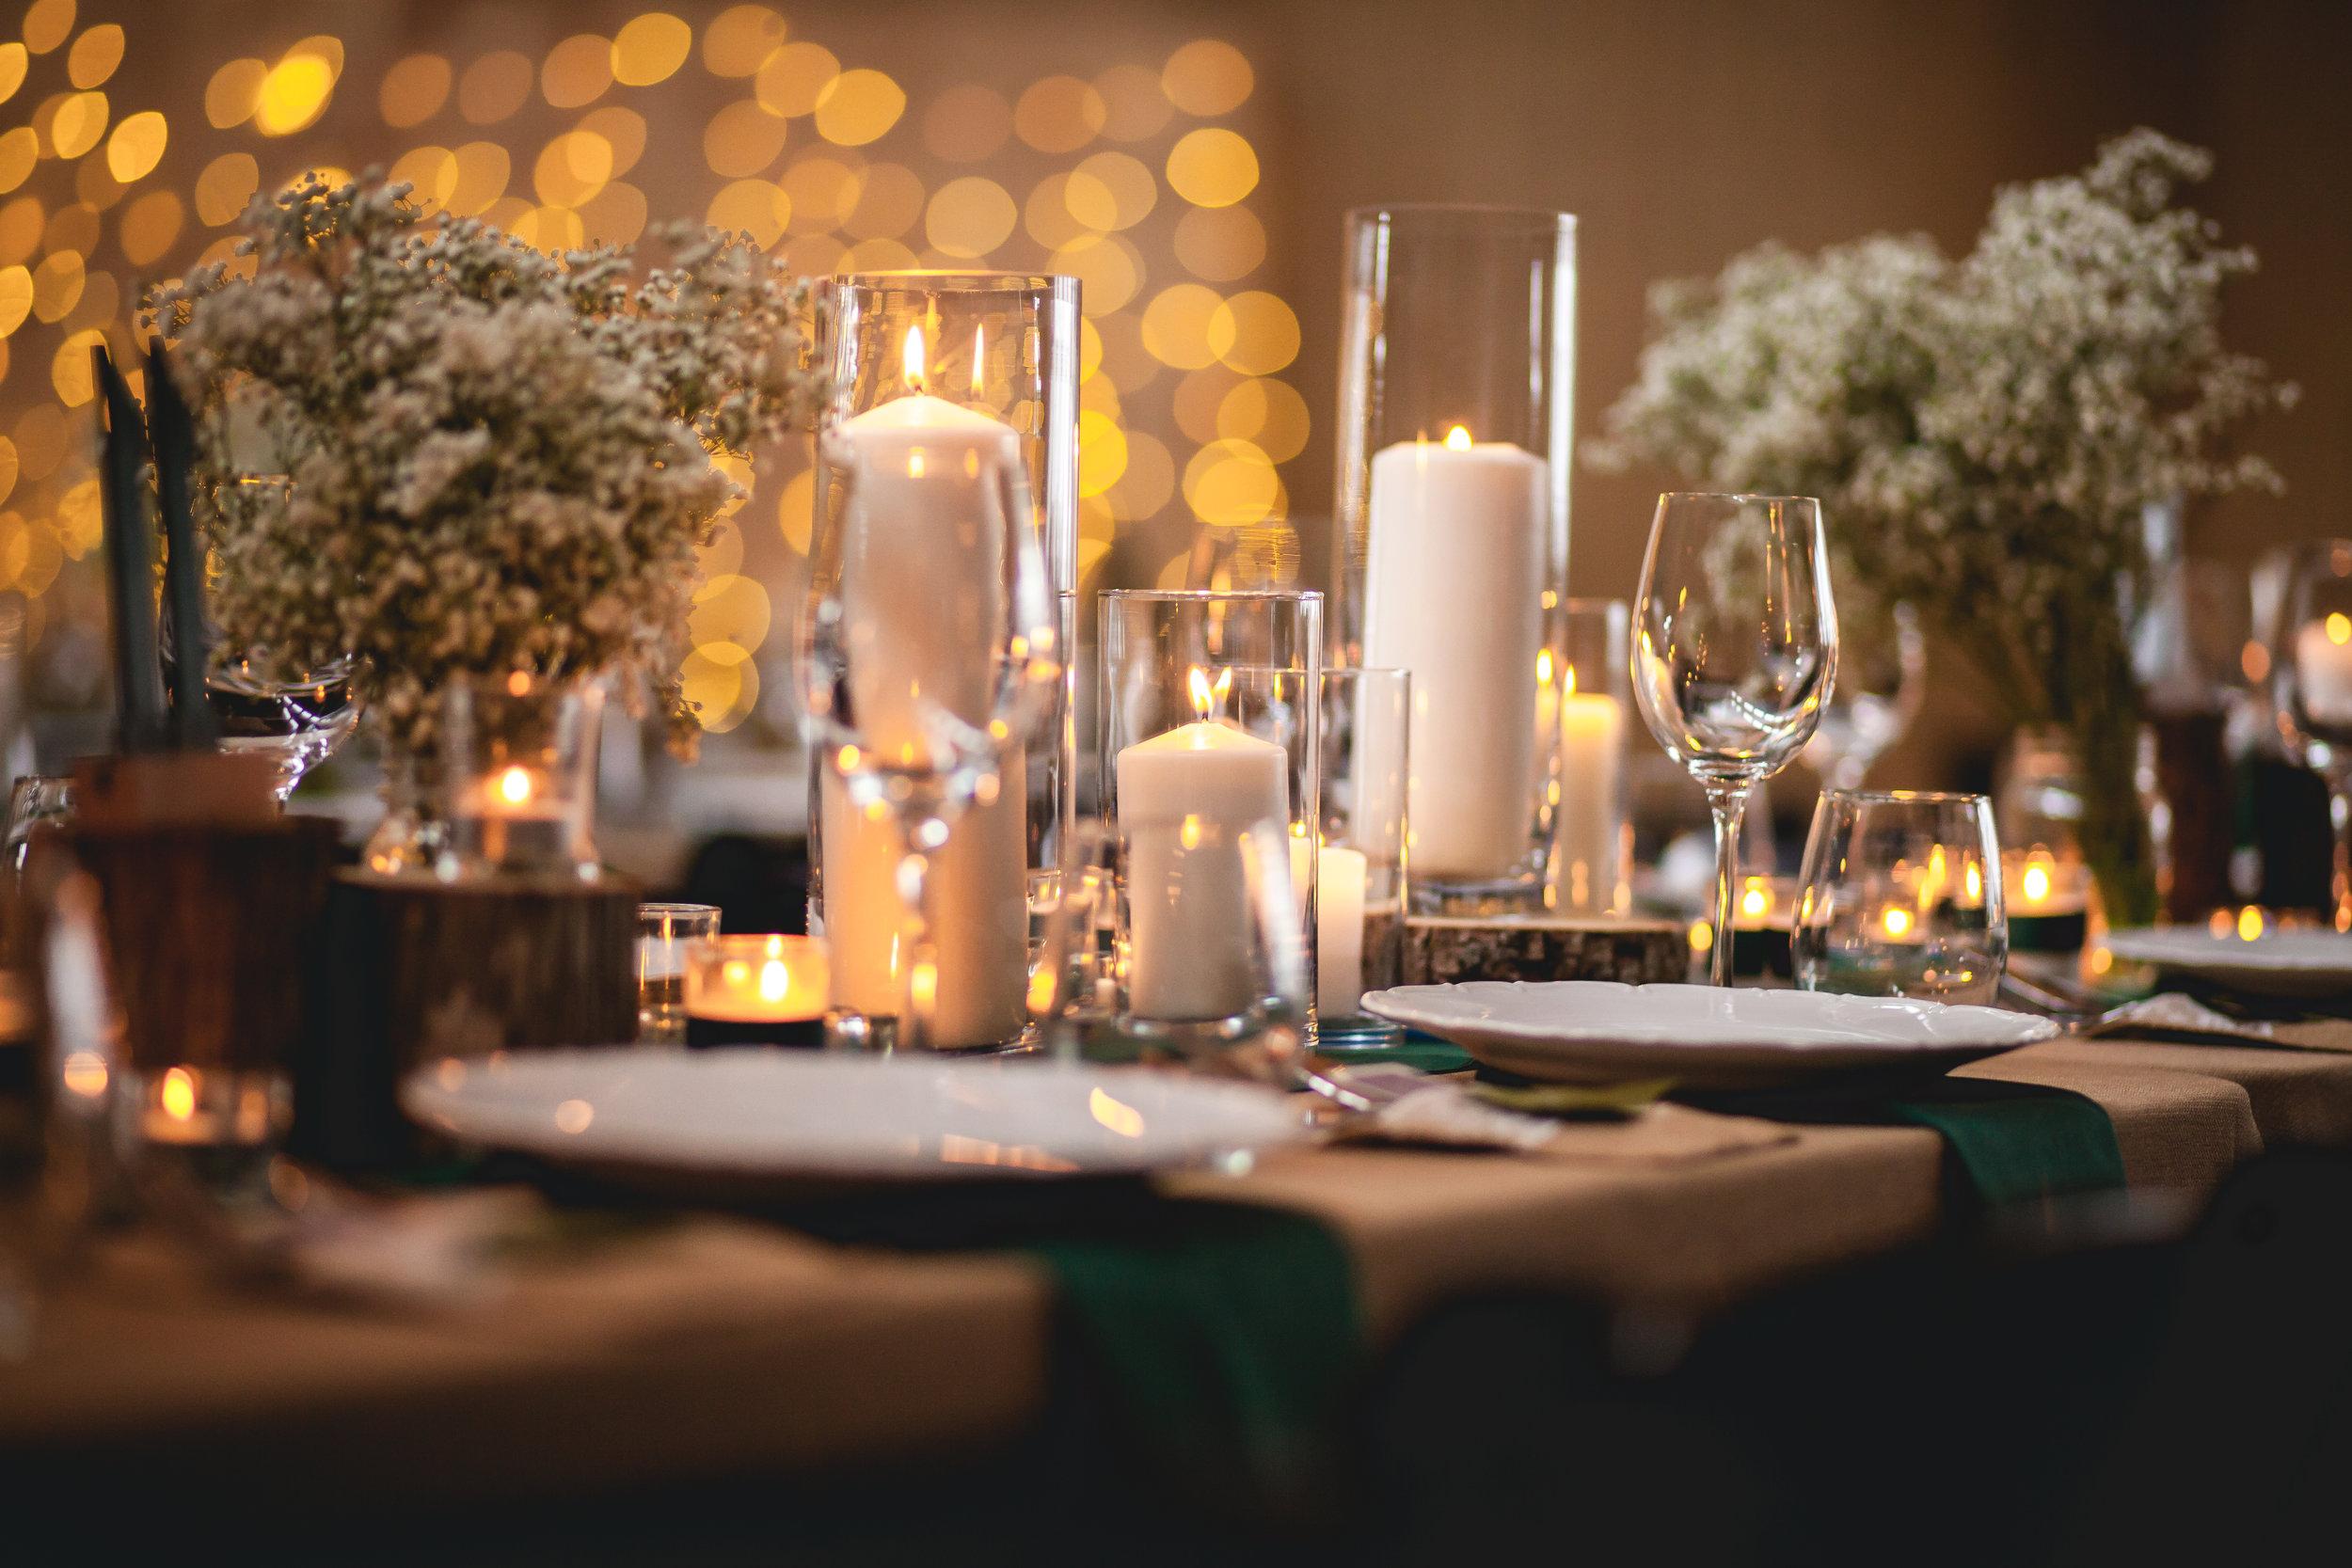 Amy D Photography- Winter Wedding- Tiffin Centre- Vintage Wedding Decor- Rustic Wedding- Wedding Decorations- Barrie Wedding Photography- Wedding Decor Ideas- Barrie Weddings (106 of 129).jpg